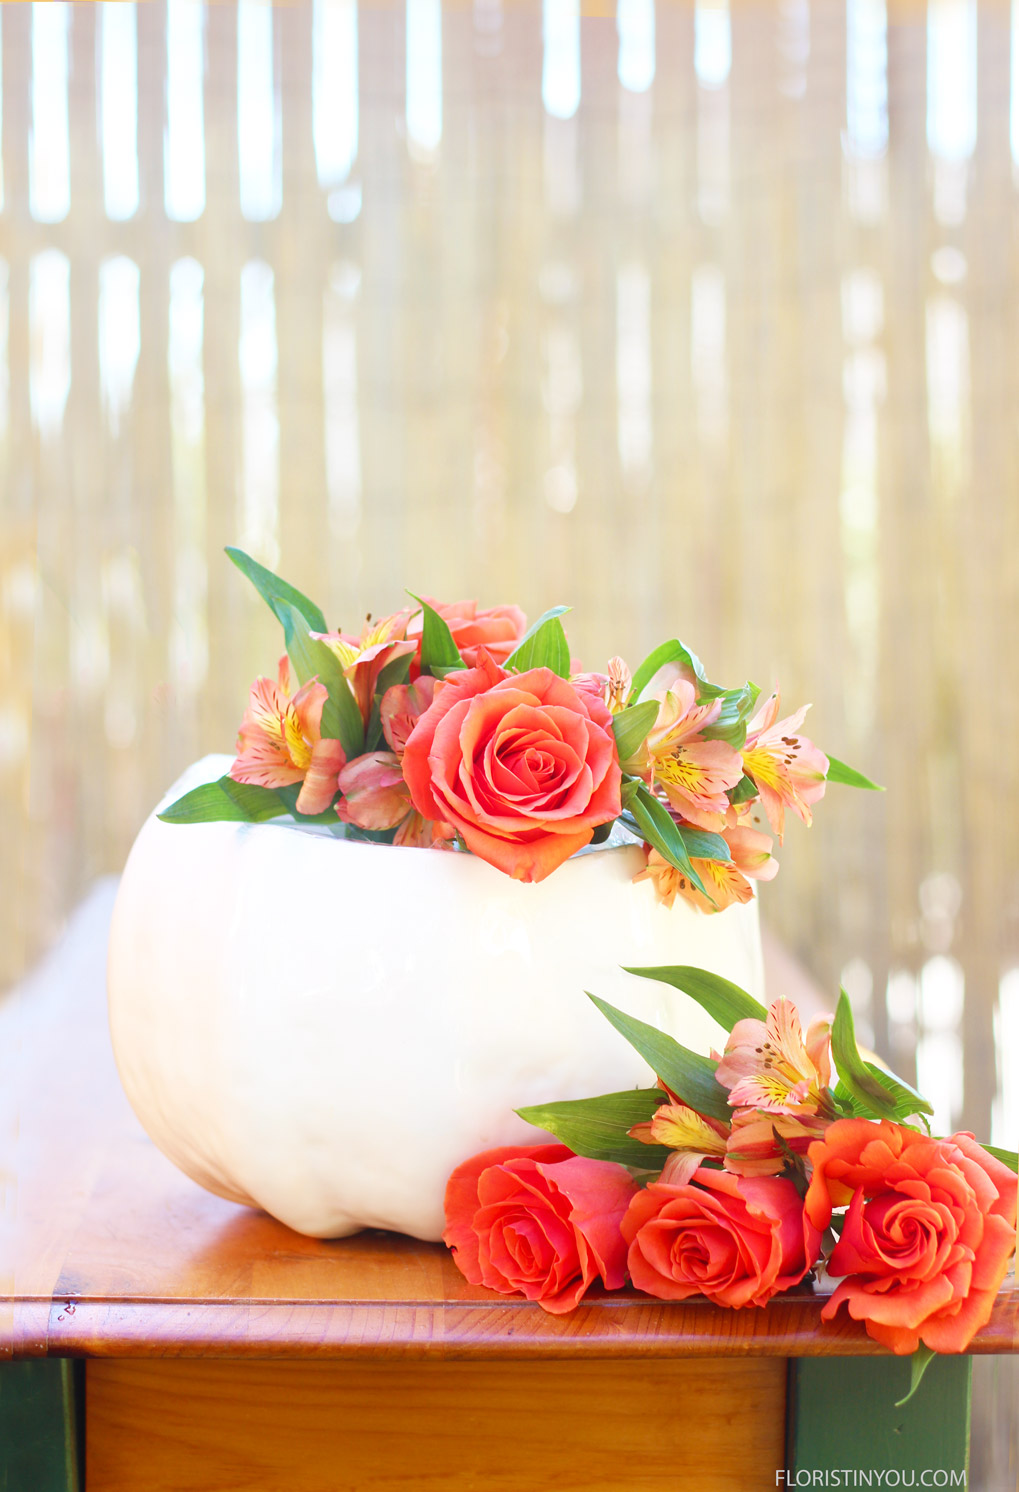 Start adding Alstroemeria with each Rose.